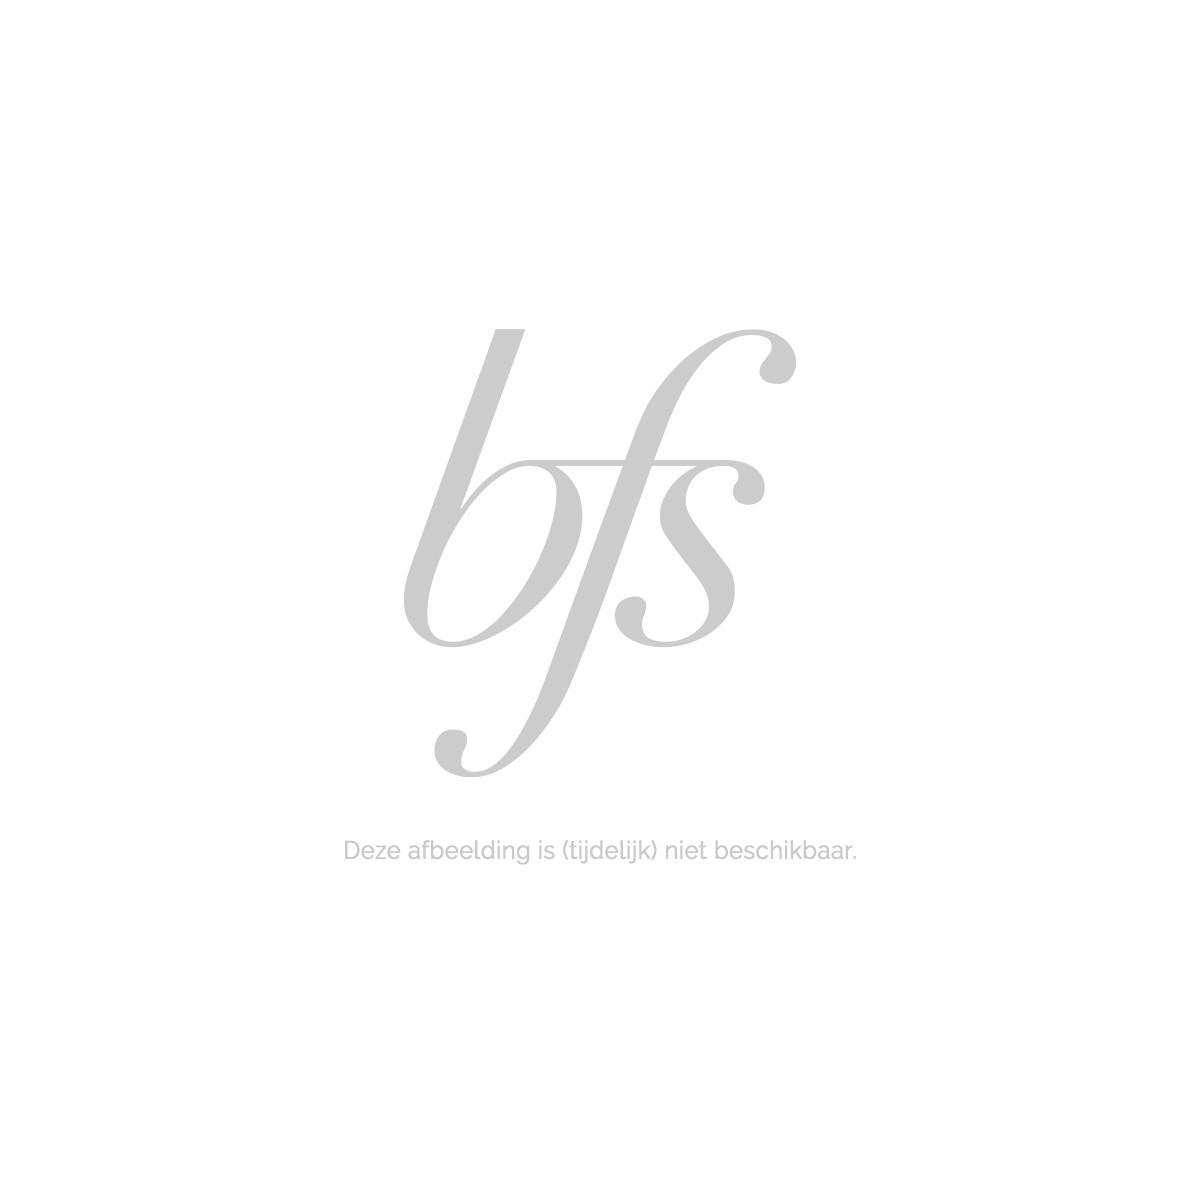 Christian Dior Diorshow Mascara Buildable Profess. Volume 10 Ml